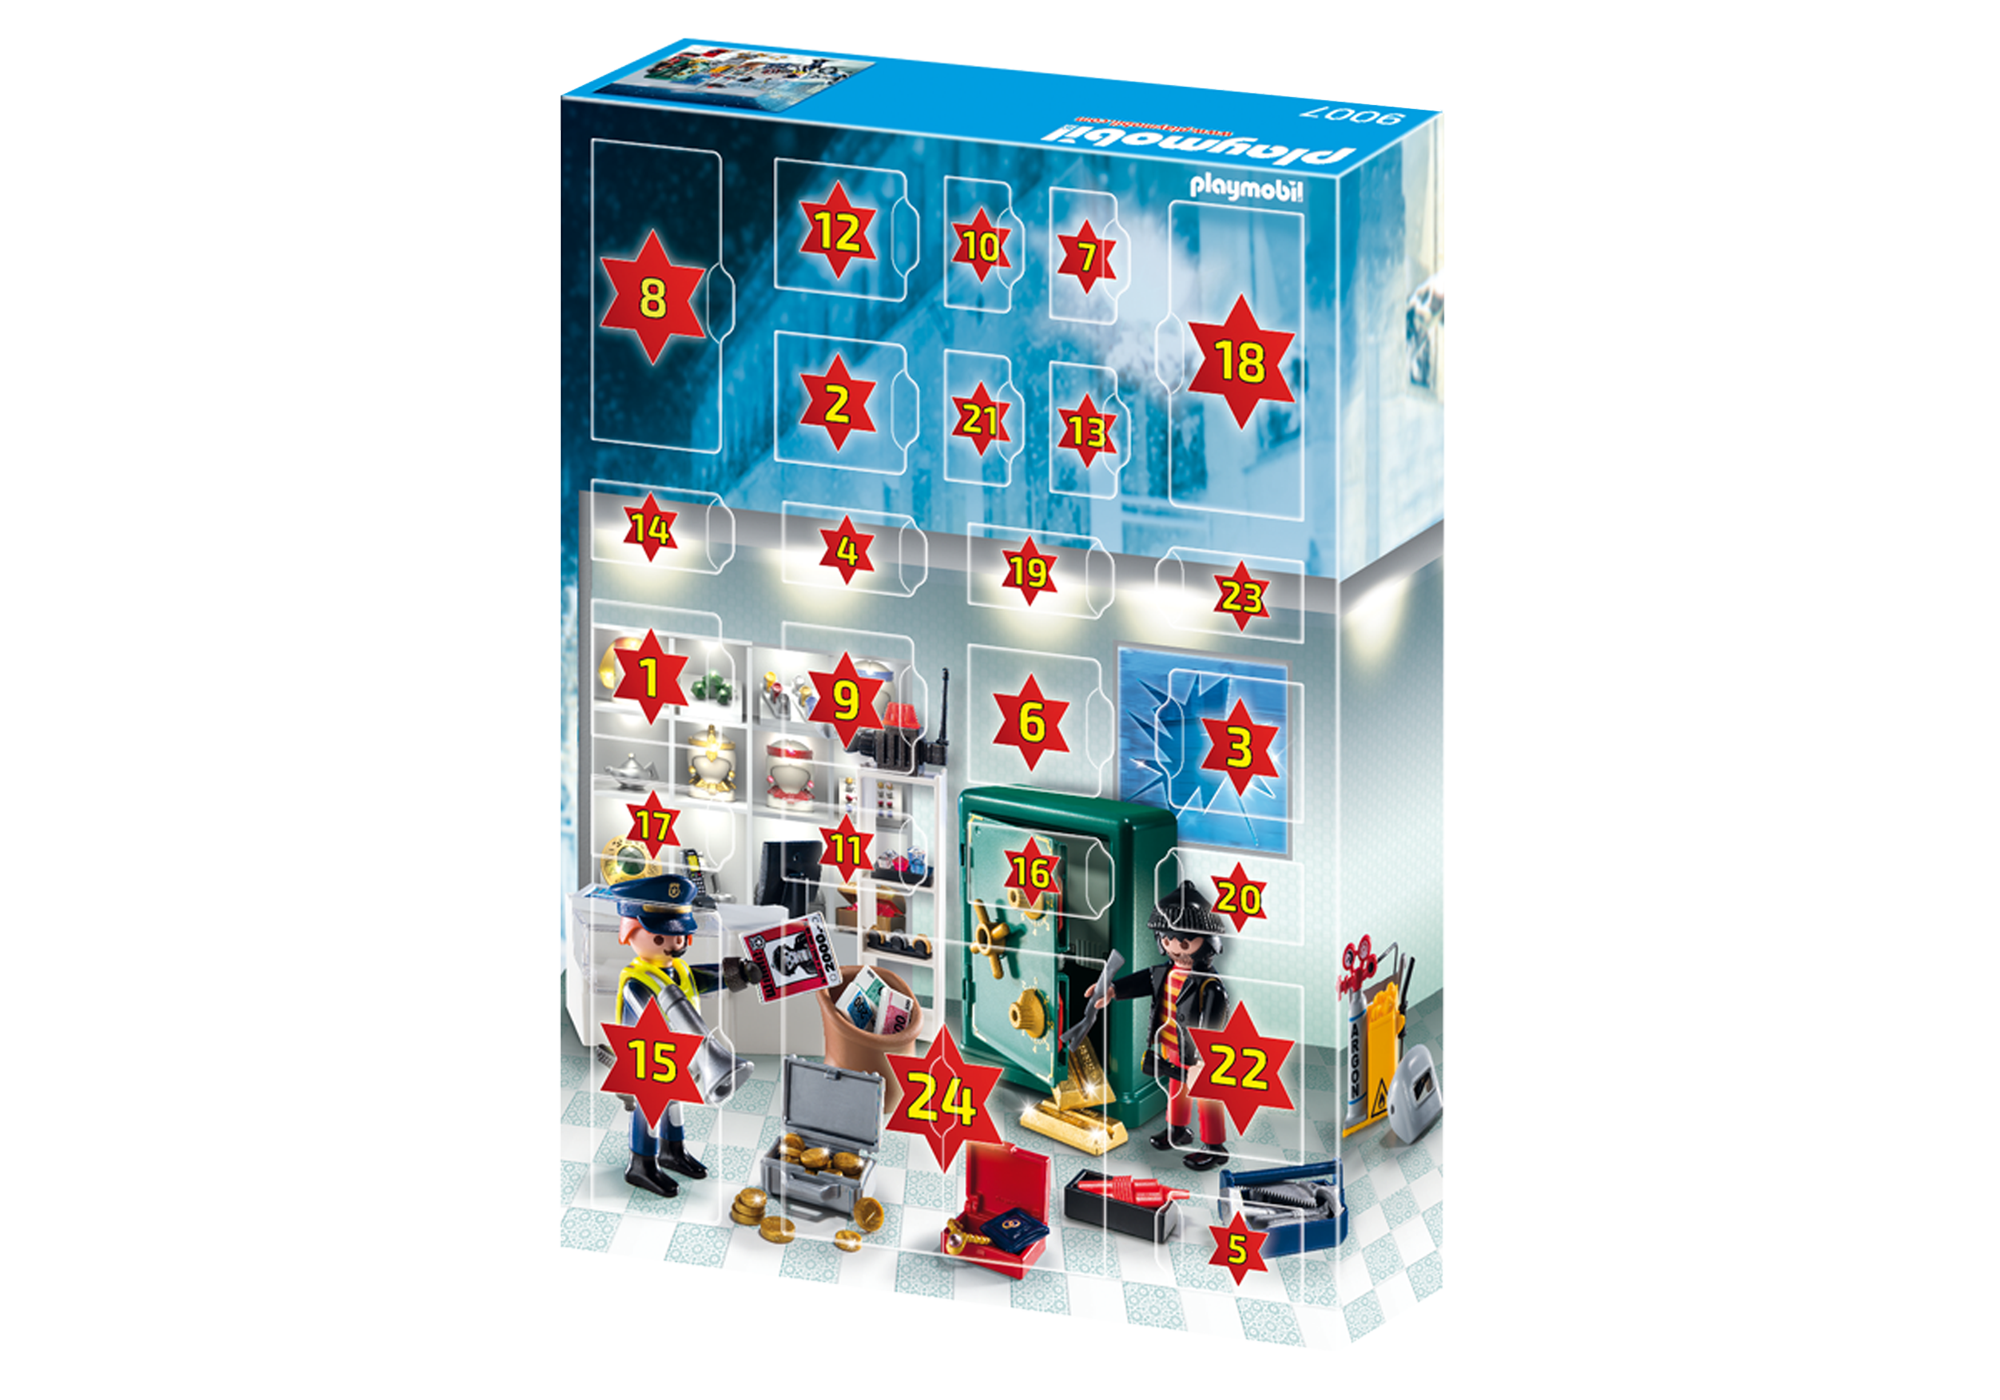 http://media.playmobil.com/i/playmobil/9007_product_extra2/Calendario de Navidad - Robo en la Joyería